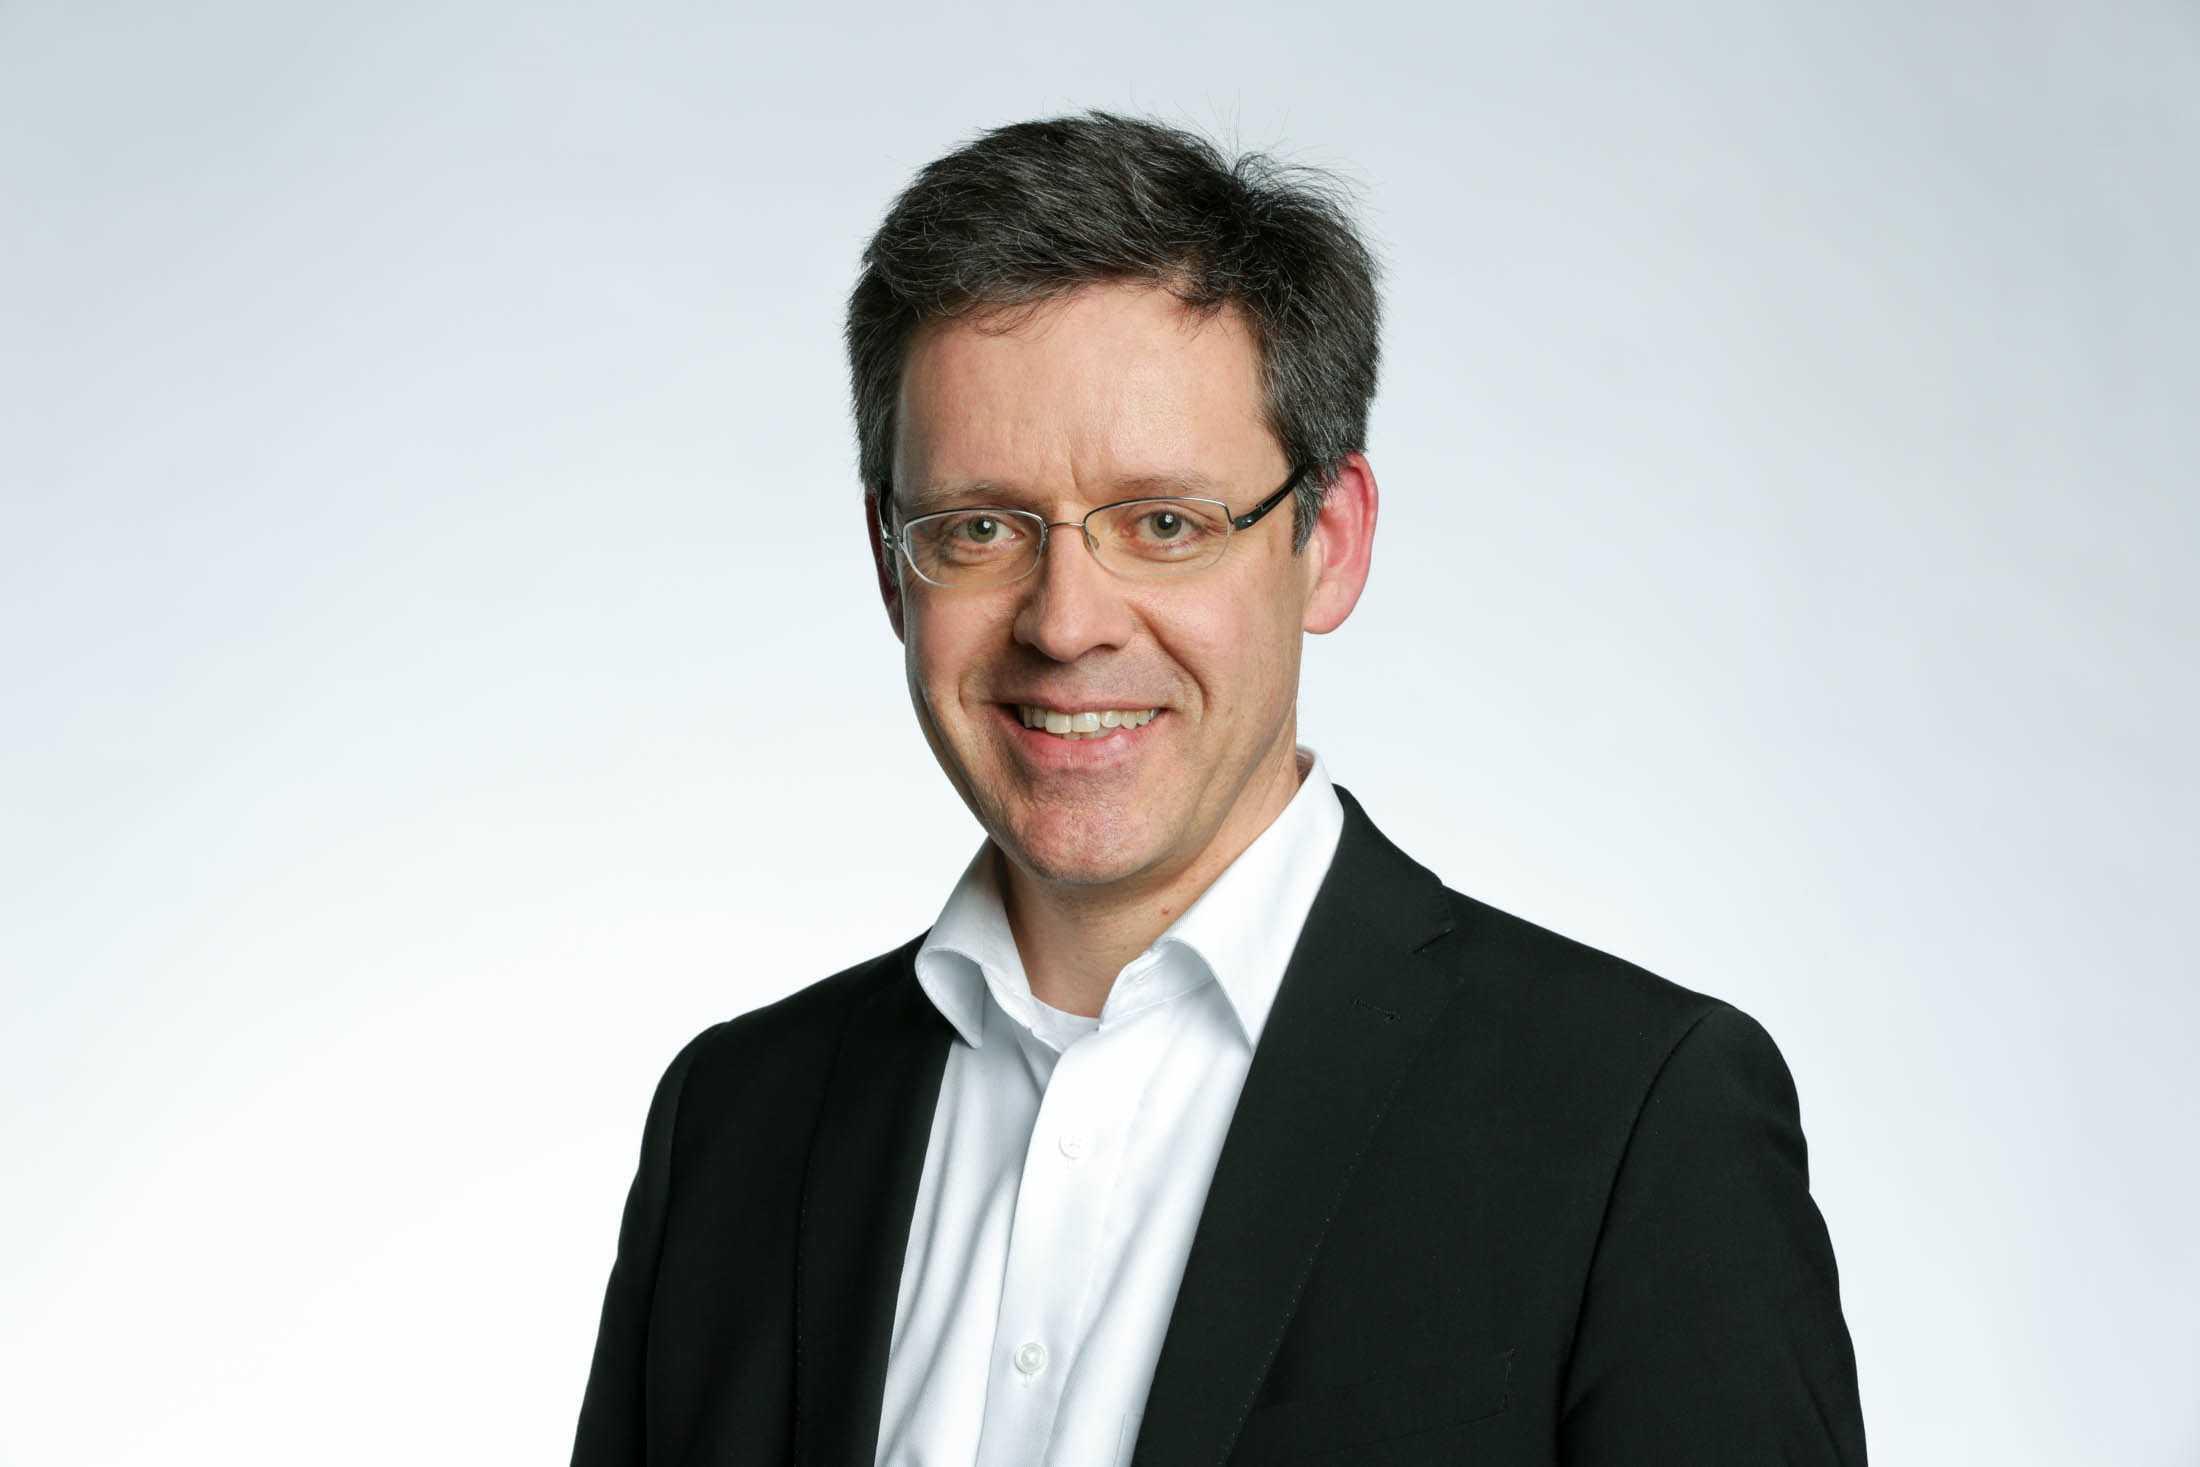 Johannes Rehmet